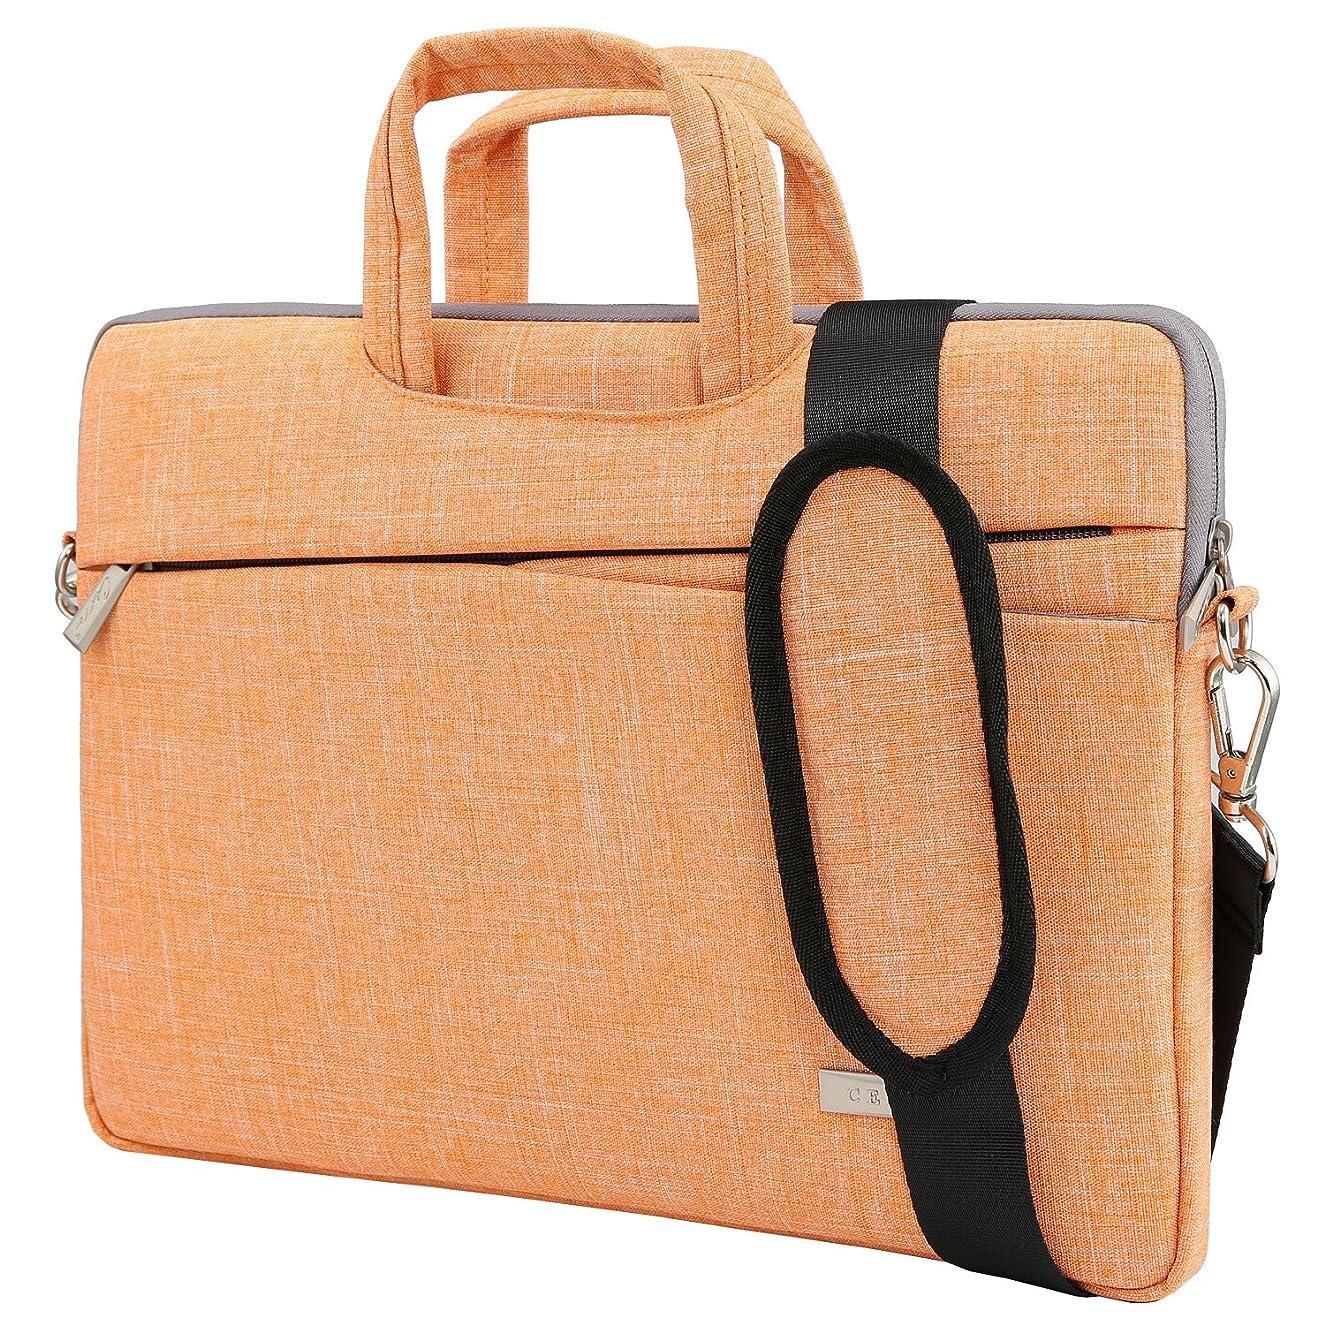 Cerro Laptop Shoulder Bag 15.6 inch,Laptop Case Sleeve,Business Briefcase Computer Bag Carrying Handle 15-15.6 inch Ultrabook (15.6 Inch, Orange)